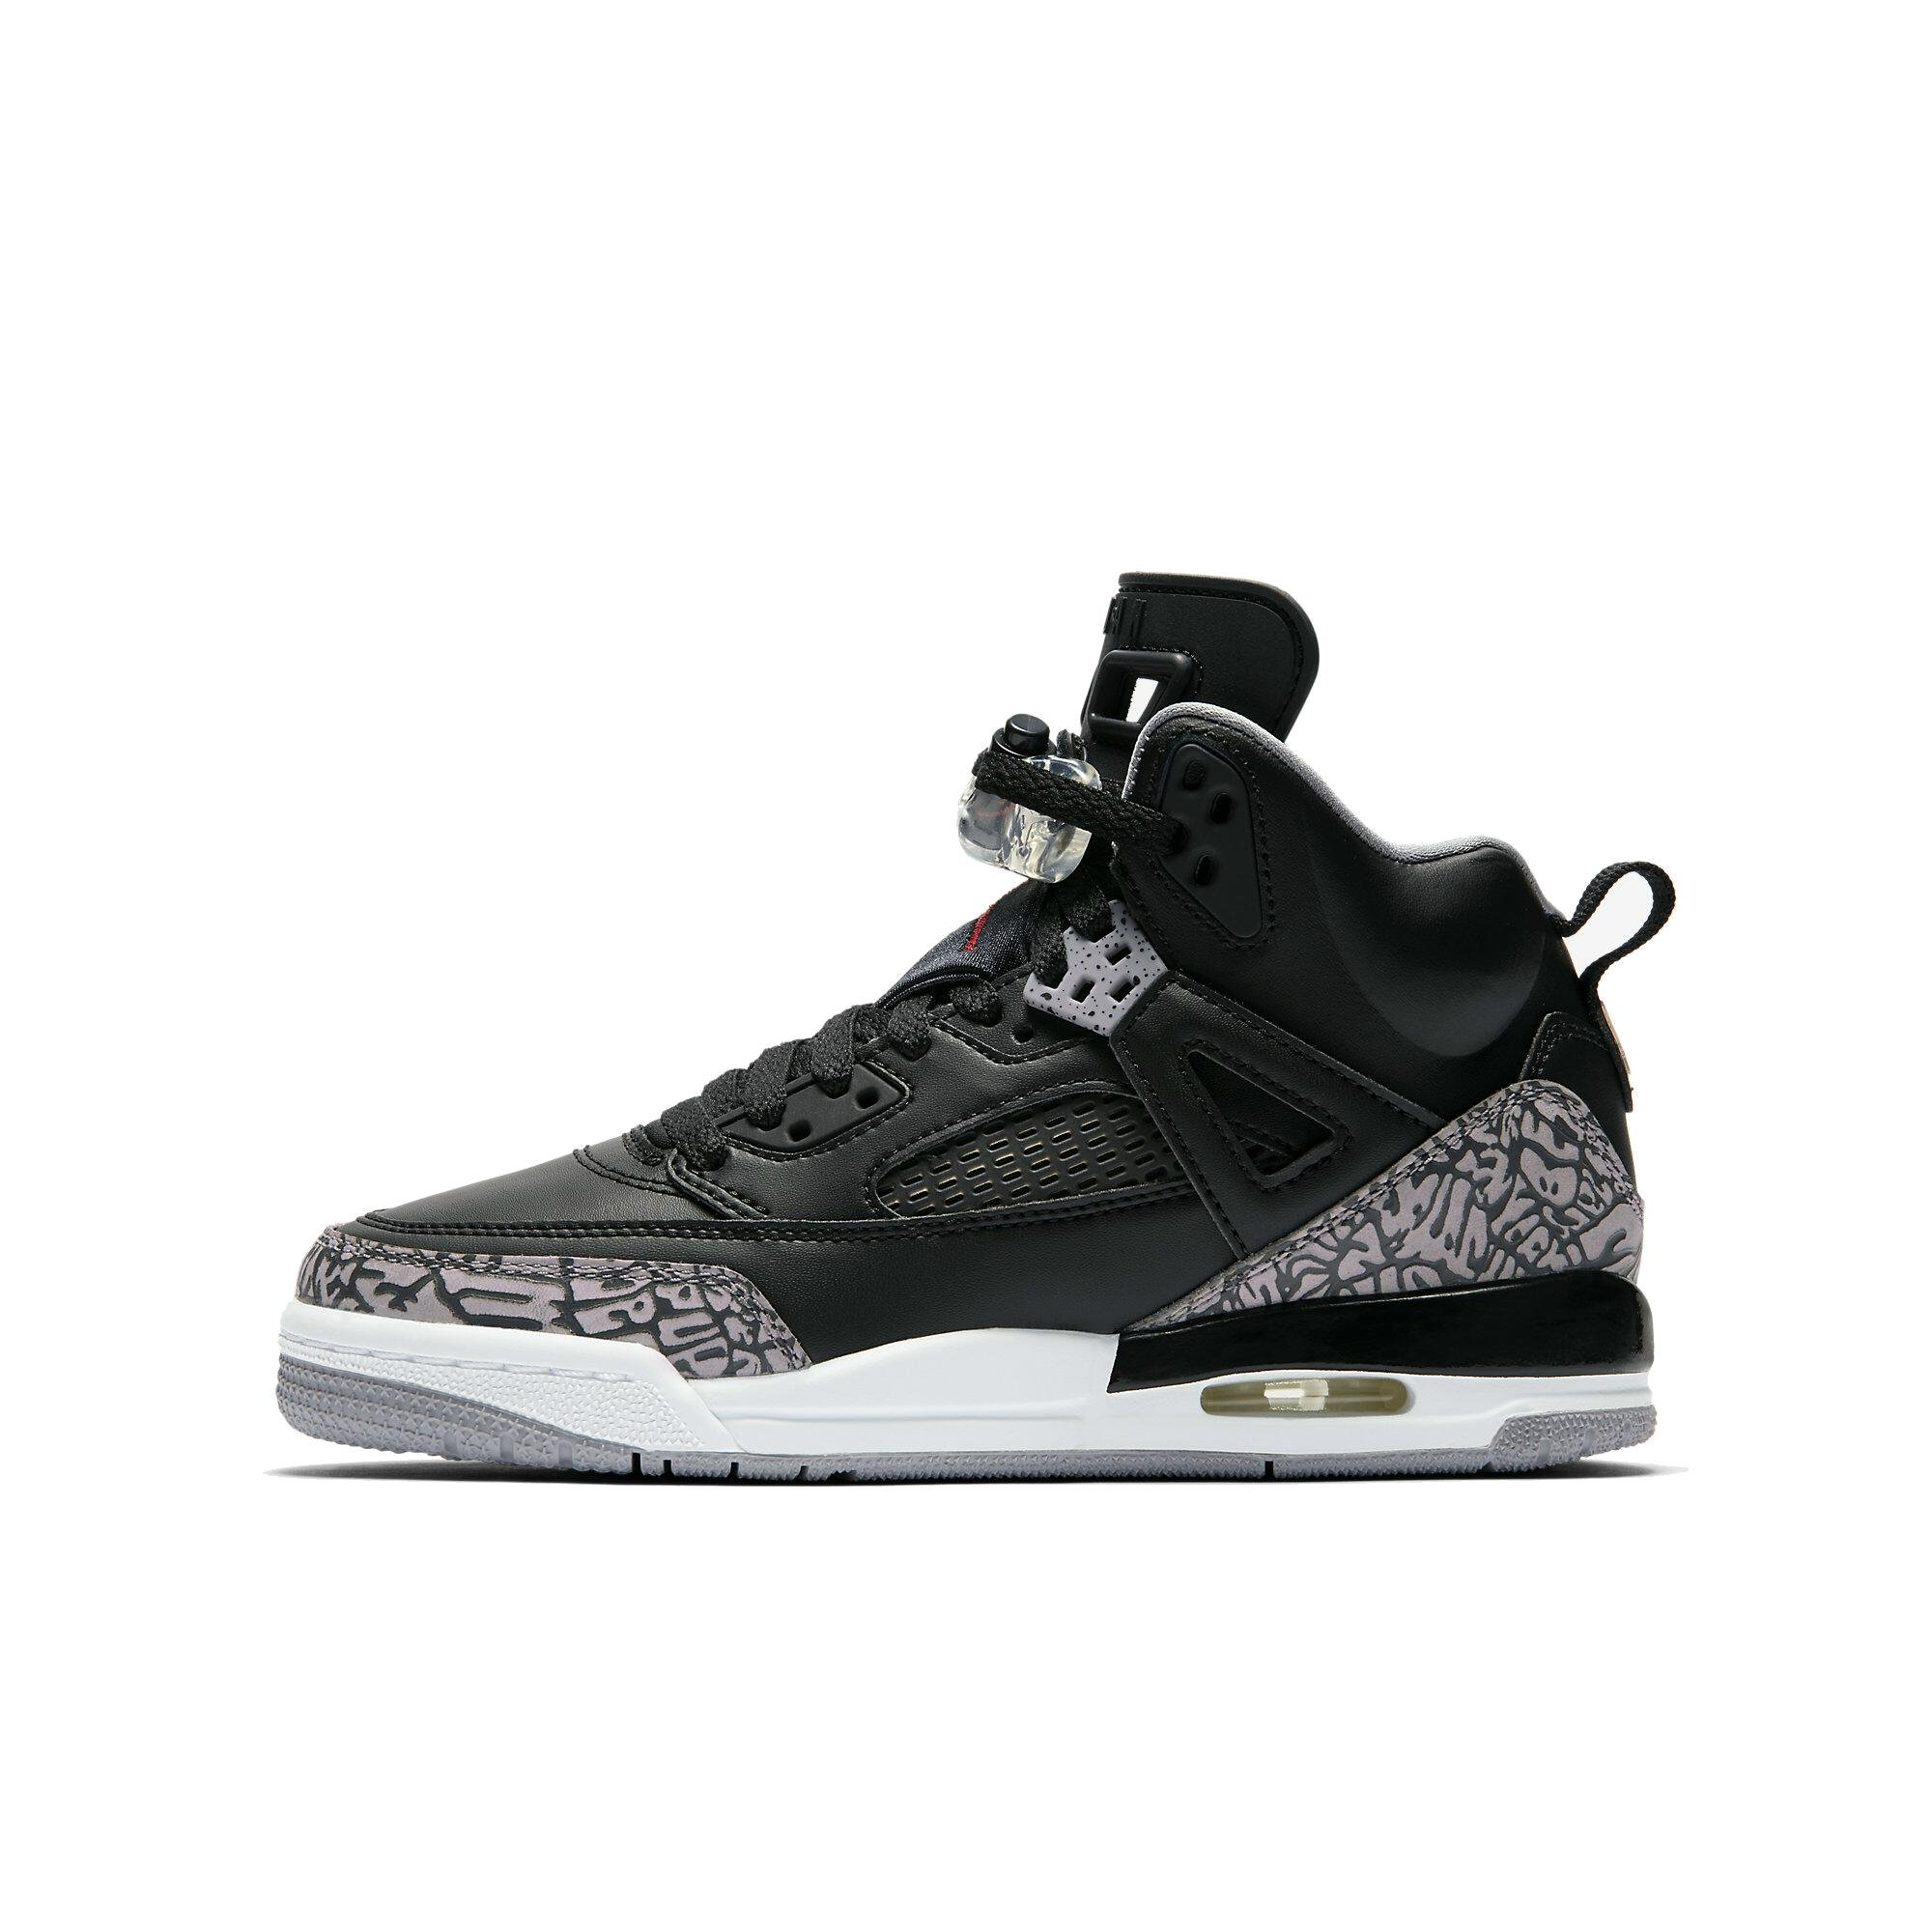 Jordan Nike Kids Spizike BG Black/Varsity Red Cement Grey Basketball Shoe 4 Kids US